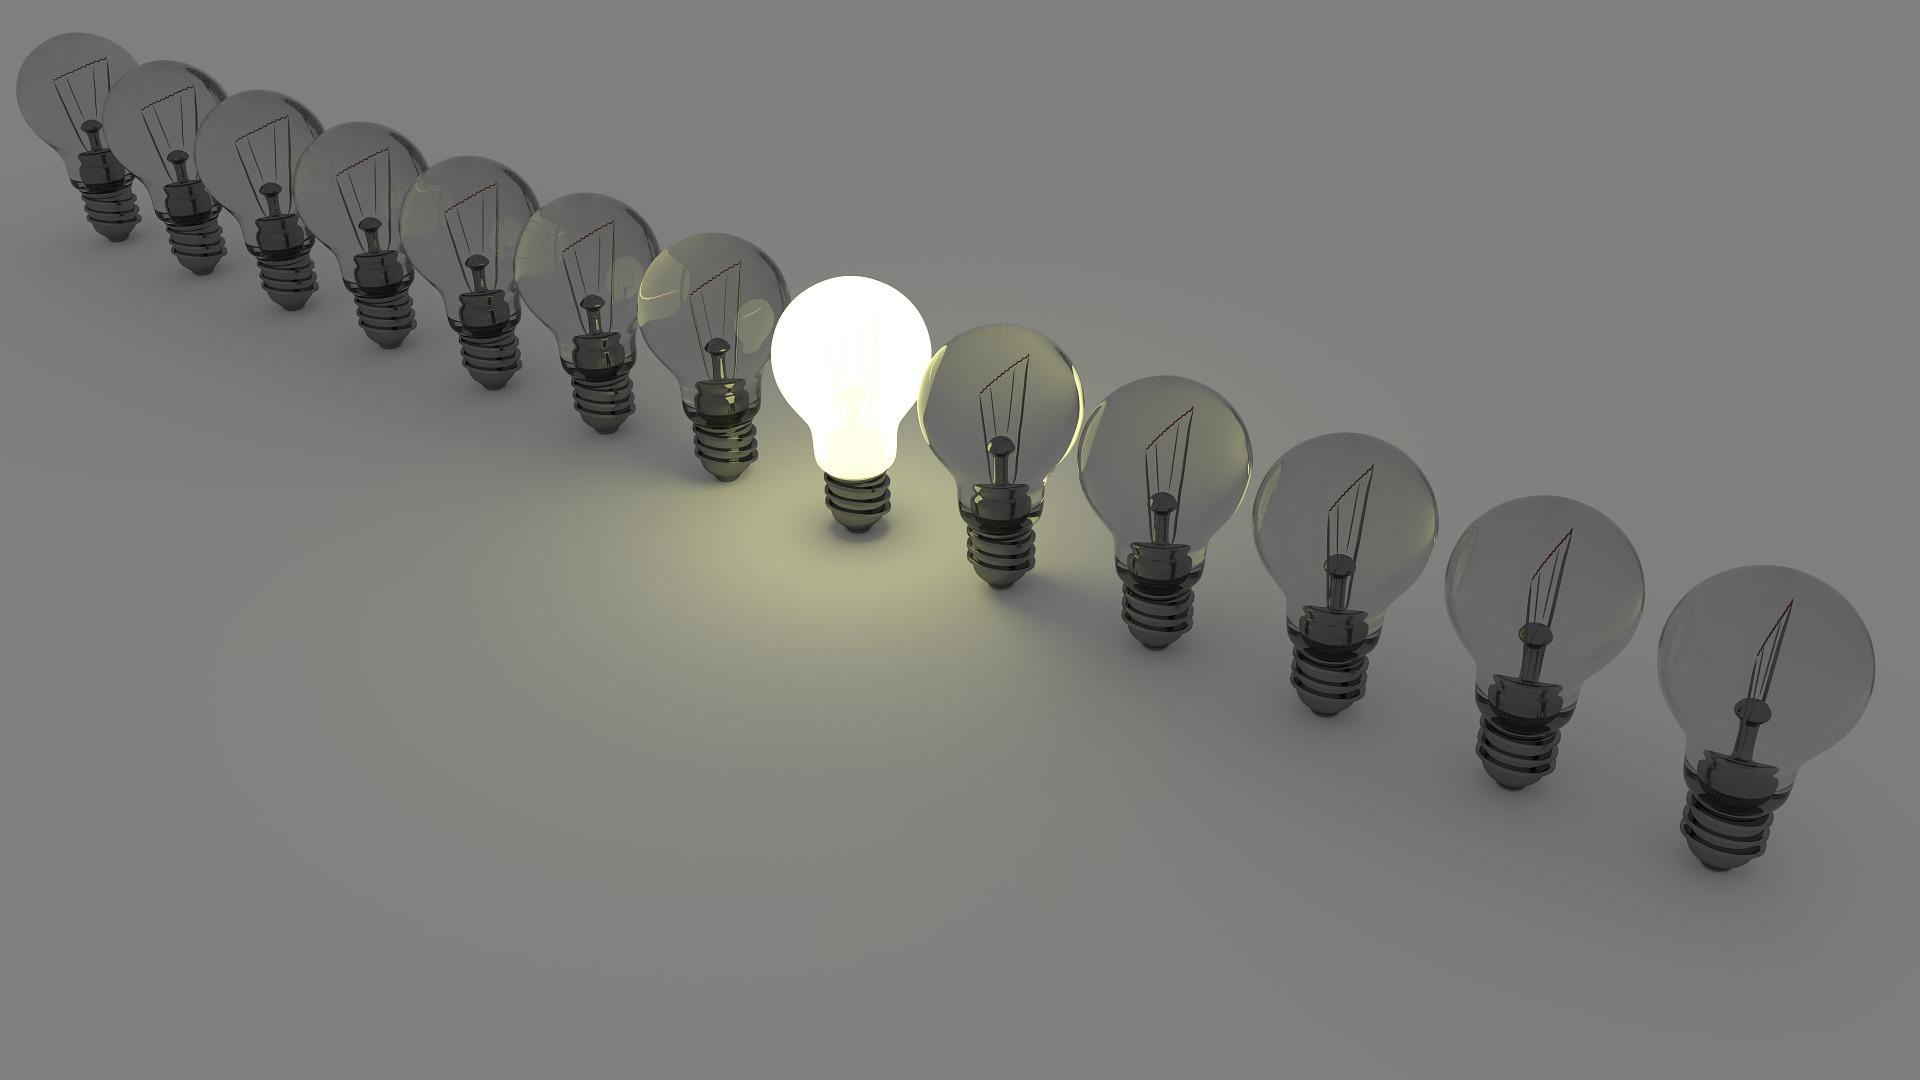 efficienza energetica TecnoAcademy